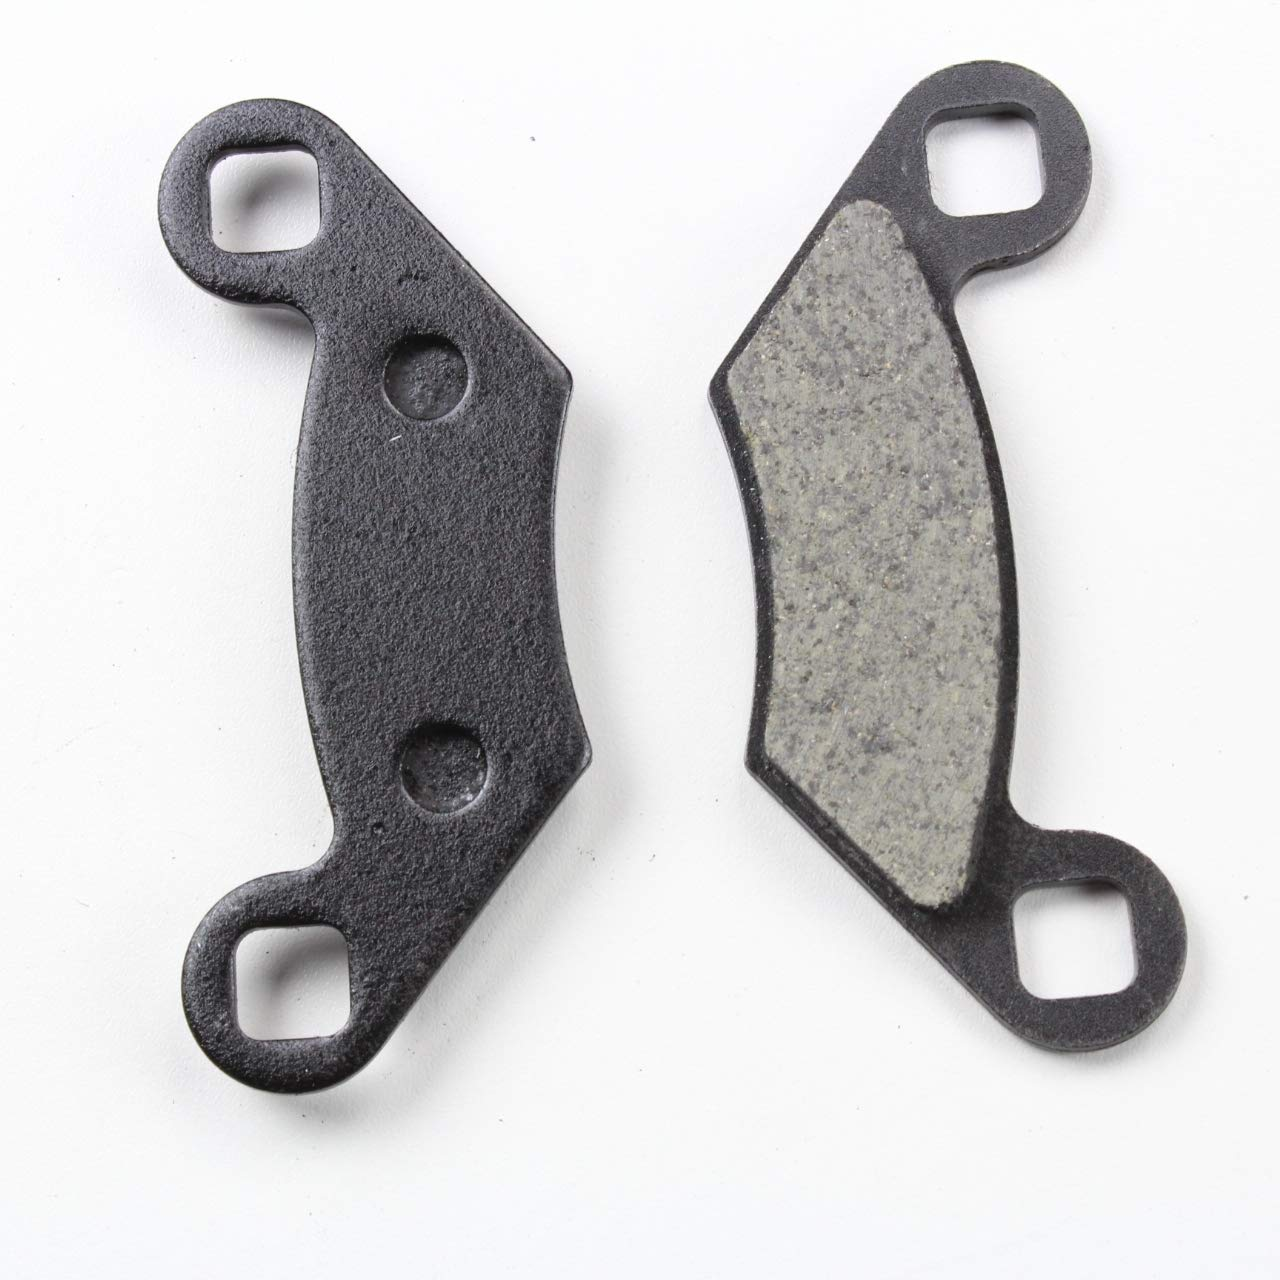 Niche Front Left /& Right Semi-Metallic Brake Pads Set for Polaris Scrambler 500 1997-2006